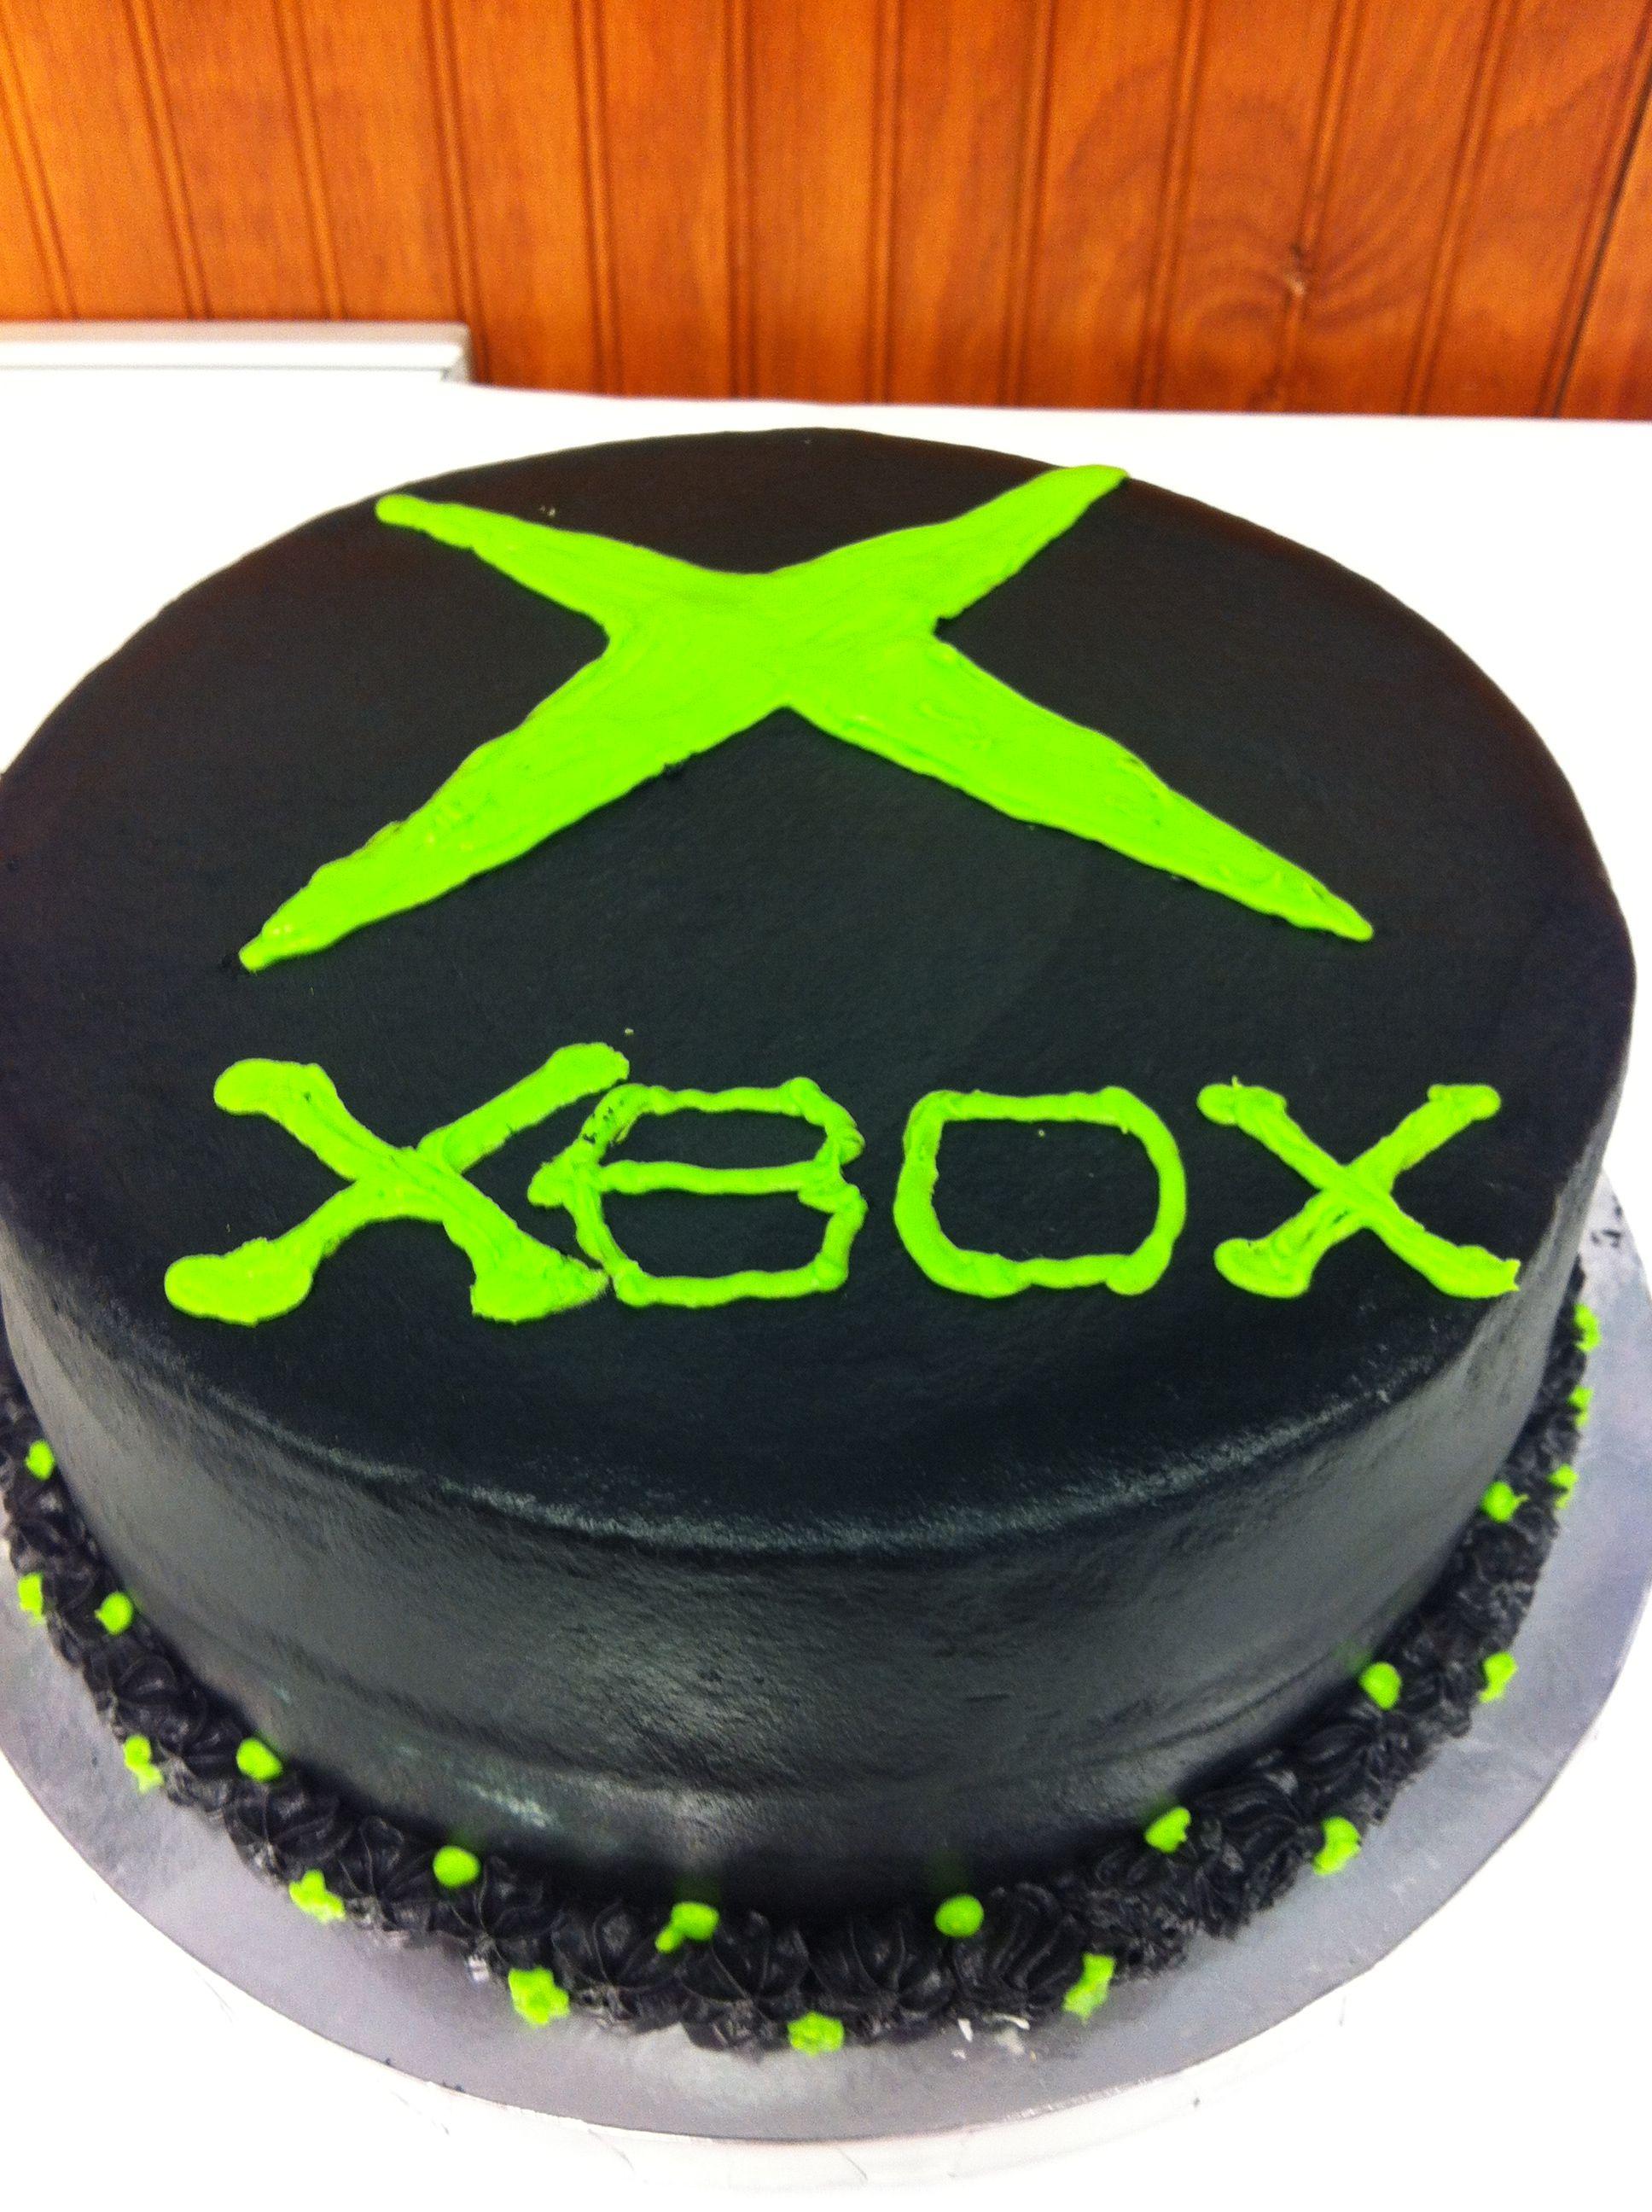 X Box Cake My Cakes Pinterest Cake Xbox Cake And Xbox One Cake